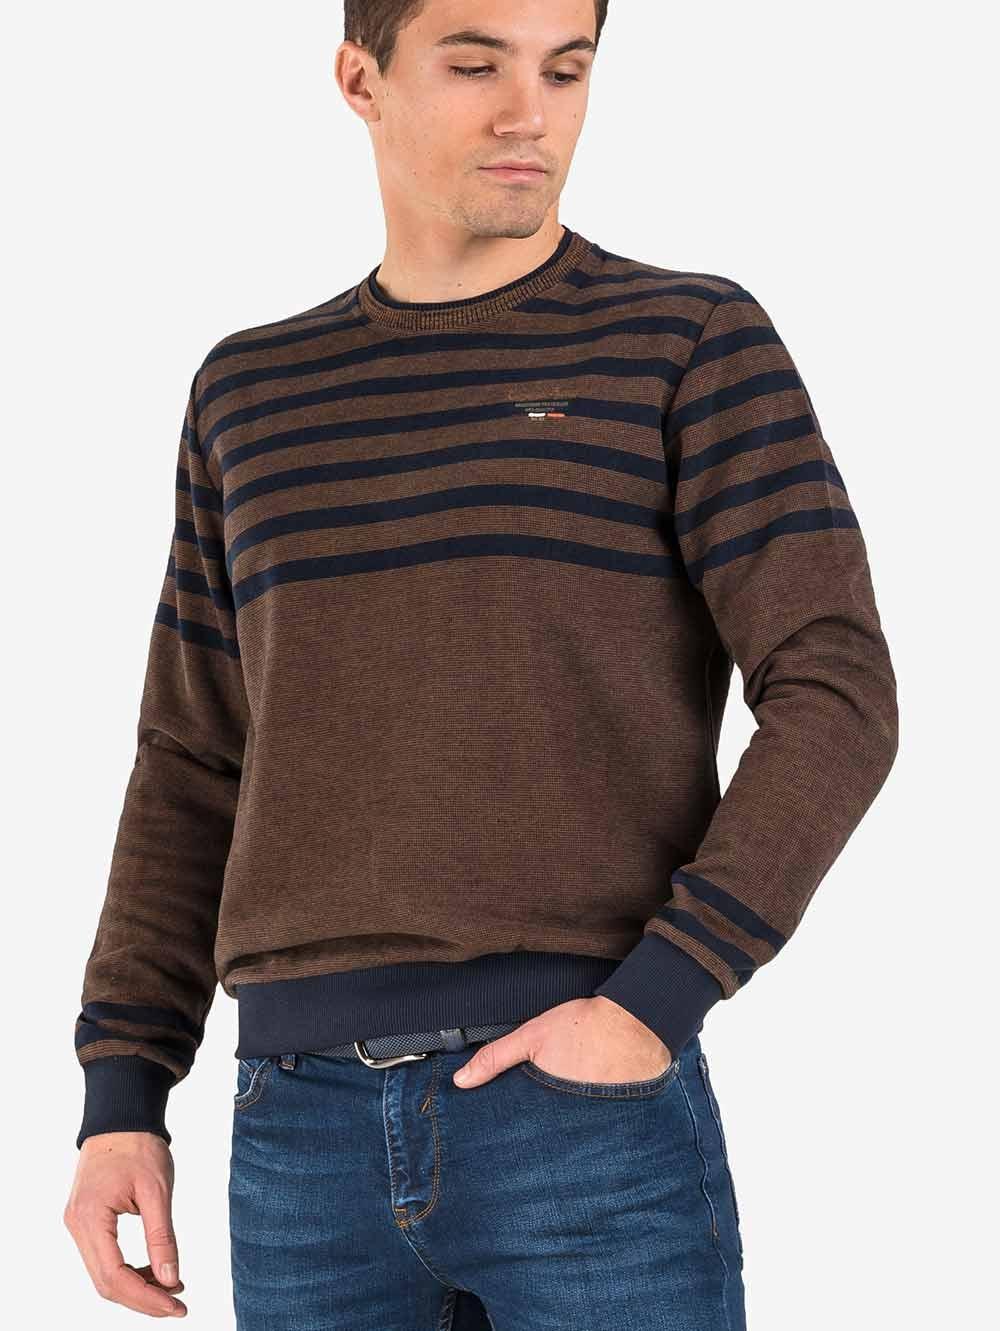 5bab5a8eb8d Мъжки кафяв пуловер MCL - големи размери   Пуловери от INDIGO Fashion